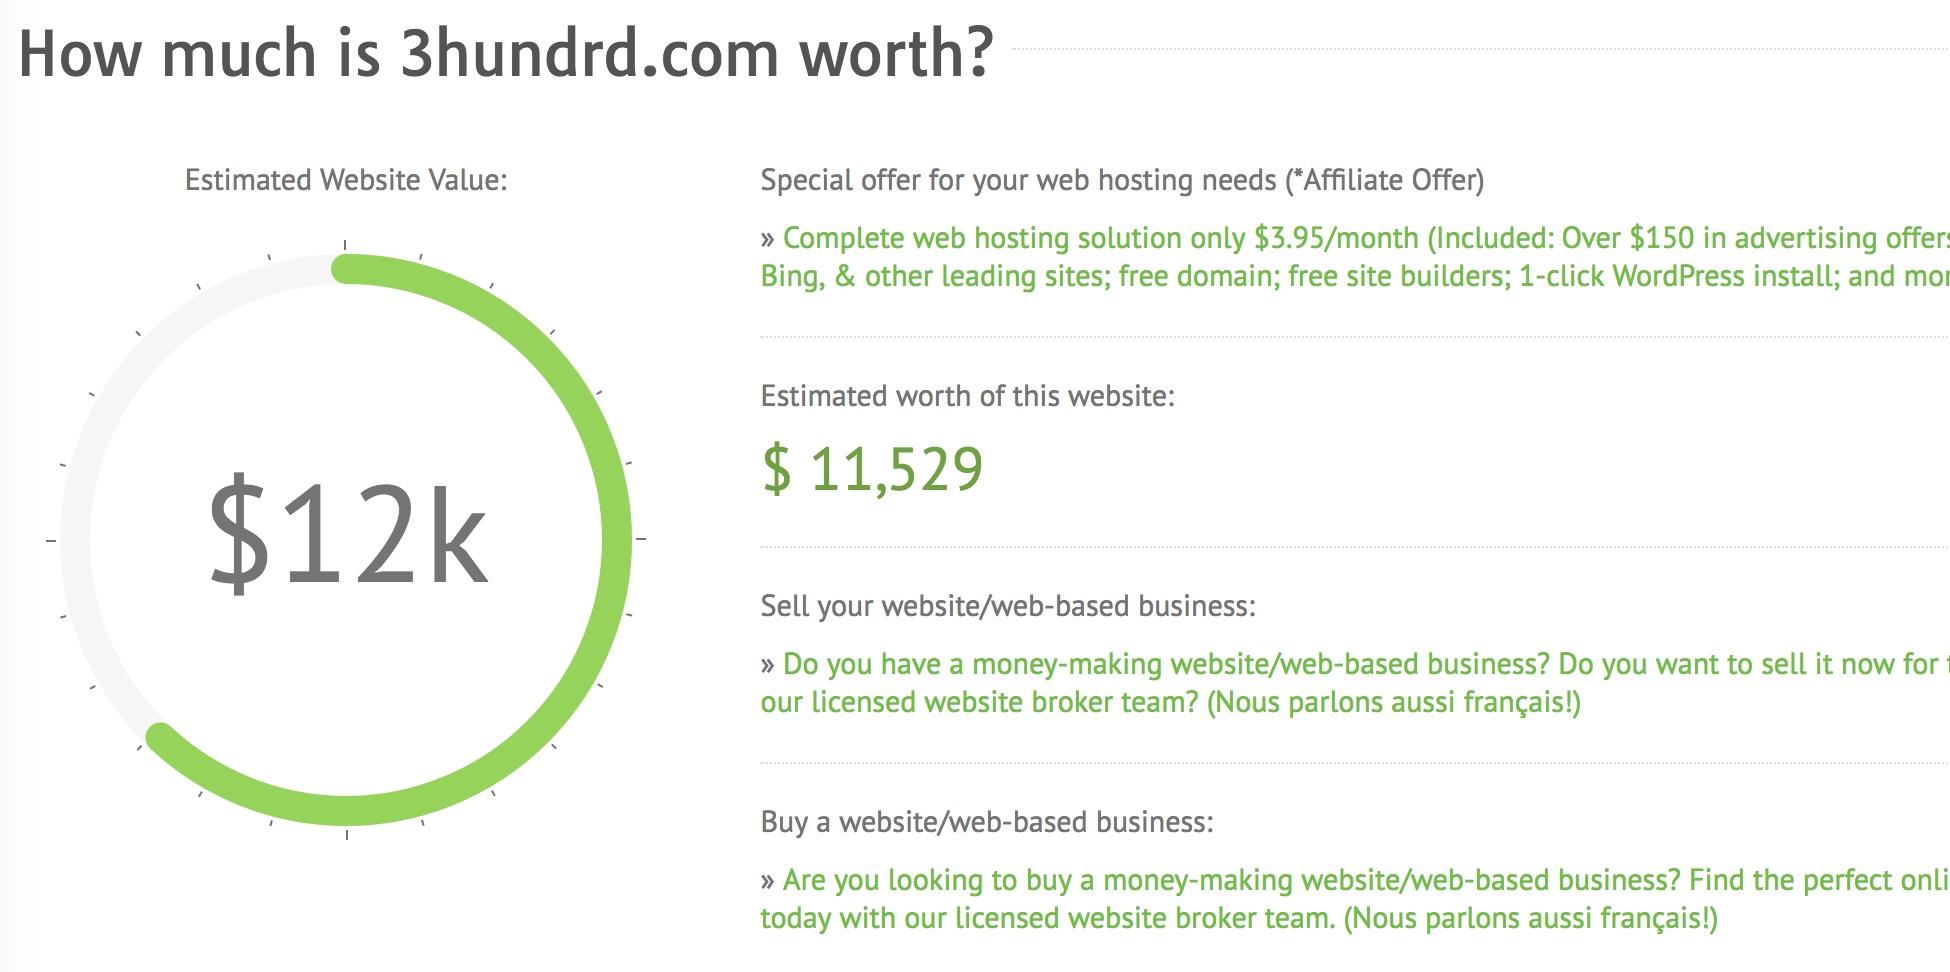 3hundrd.com is worth $11,529